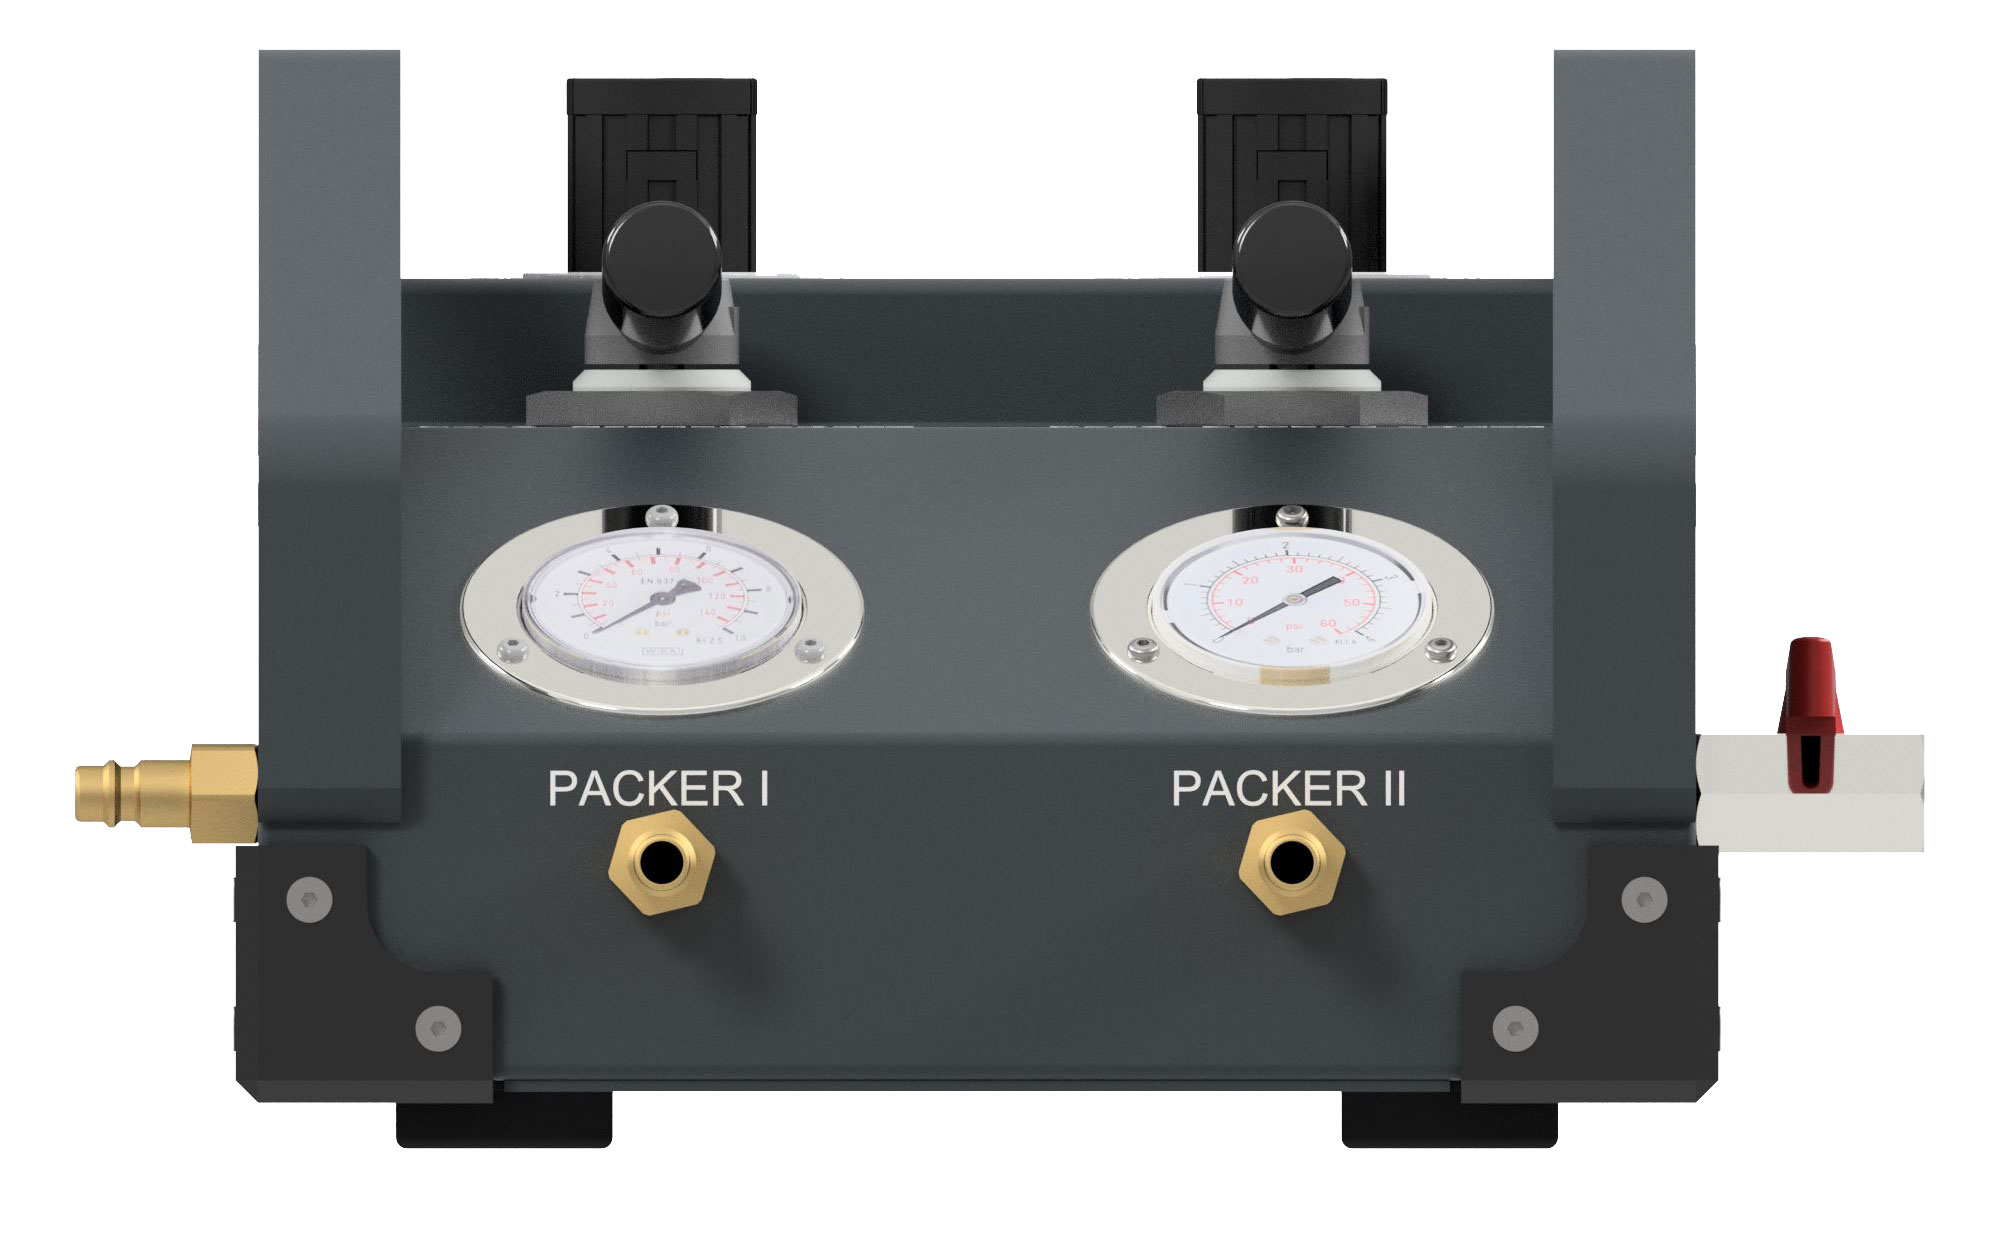 28100015-ZSB-Druckbox-PBX-2-Alu-006-01